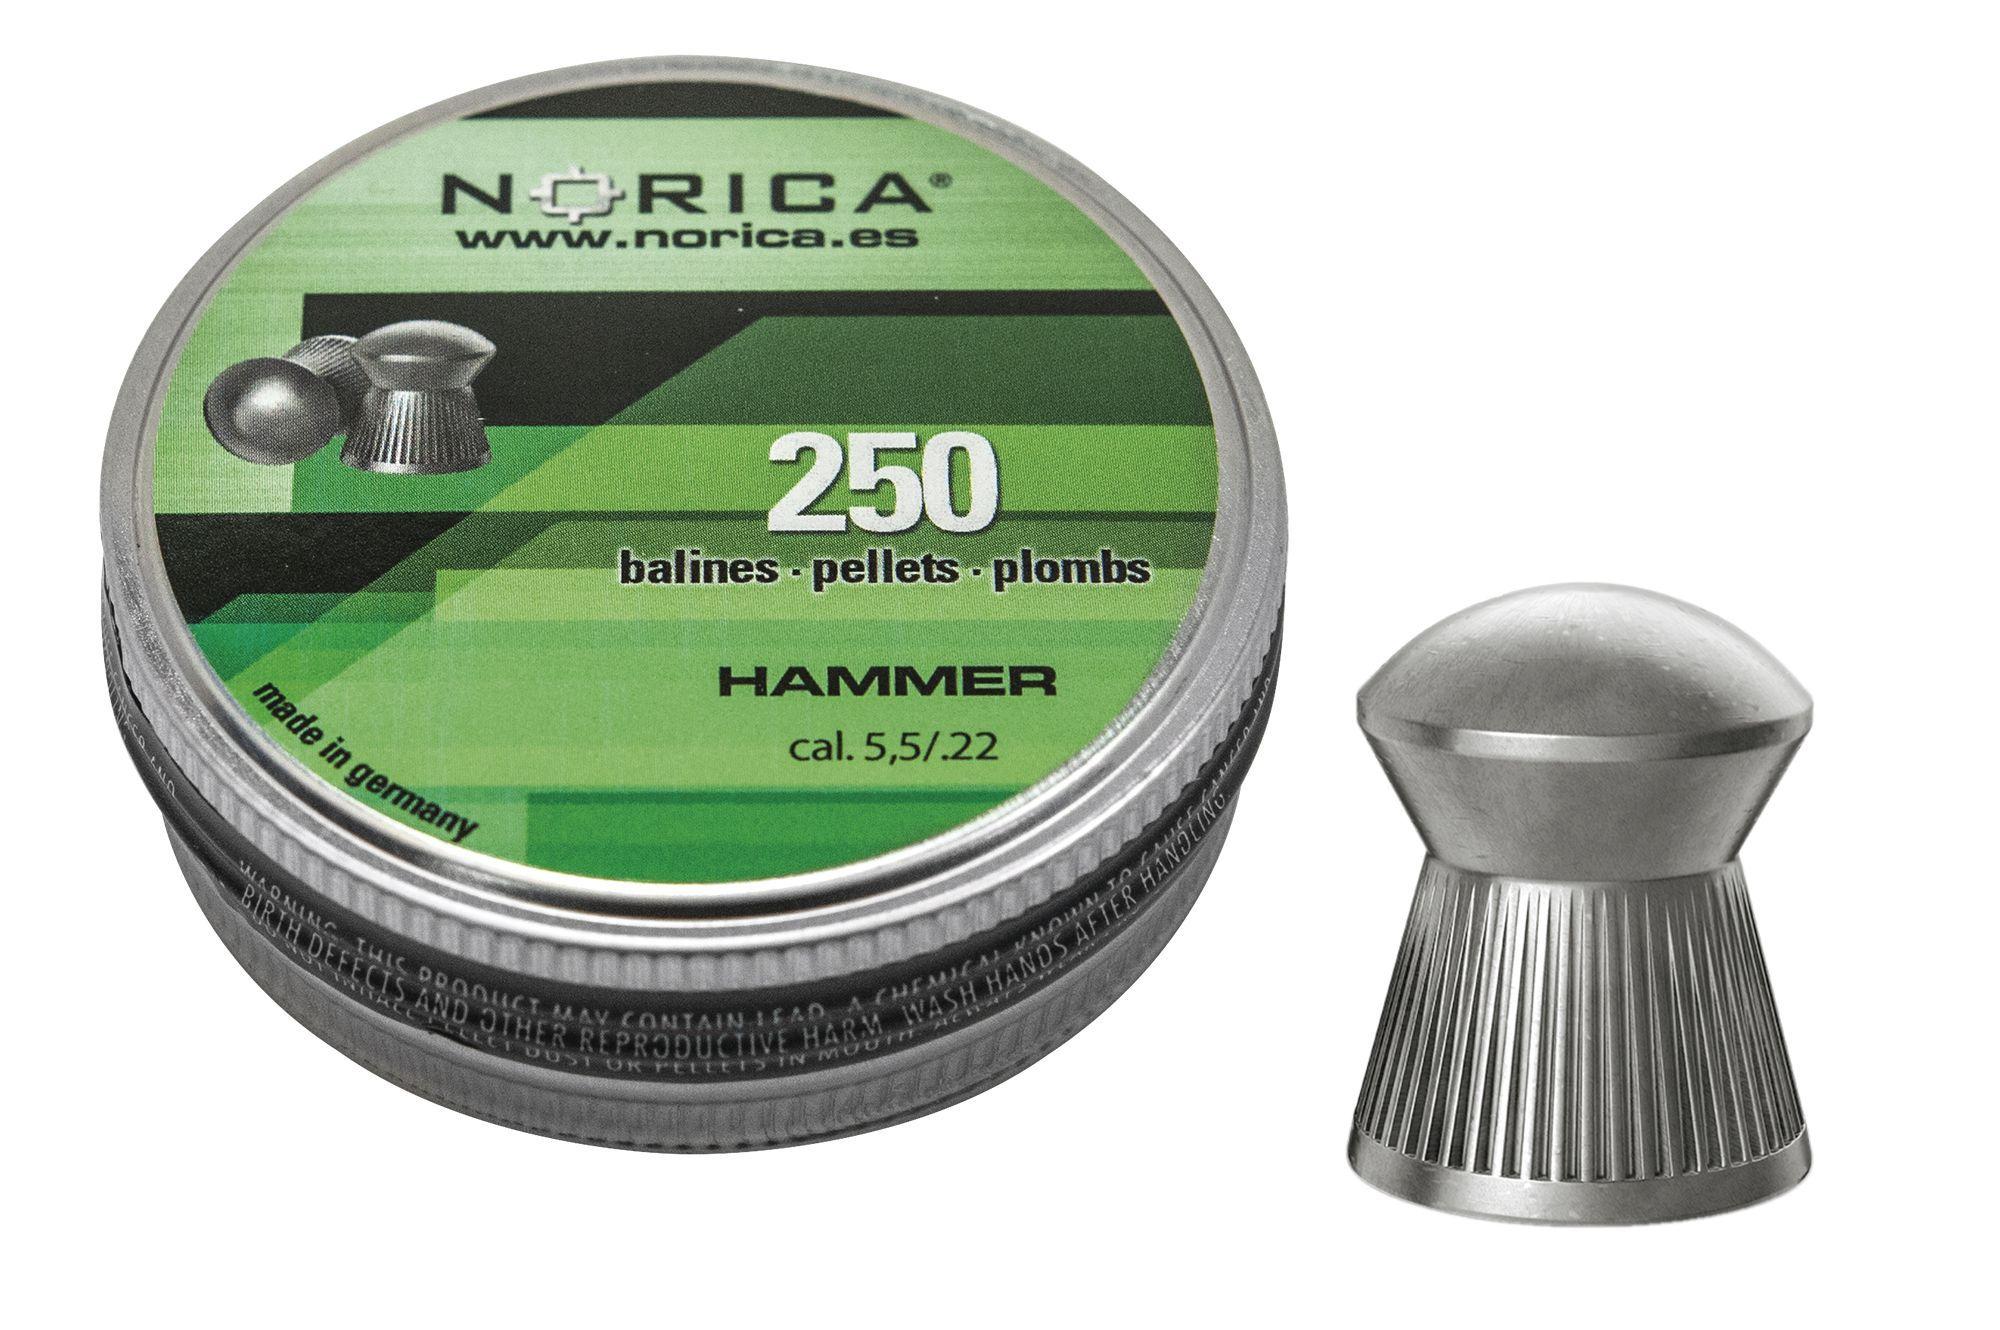 Diabolky NORICA Hammer 5,5 mm 250 ks